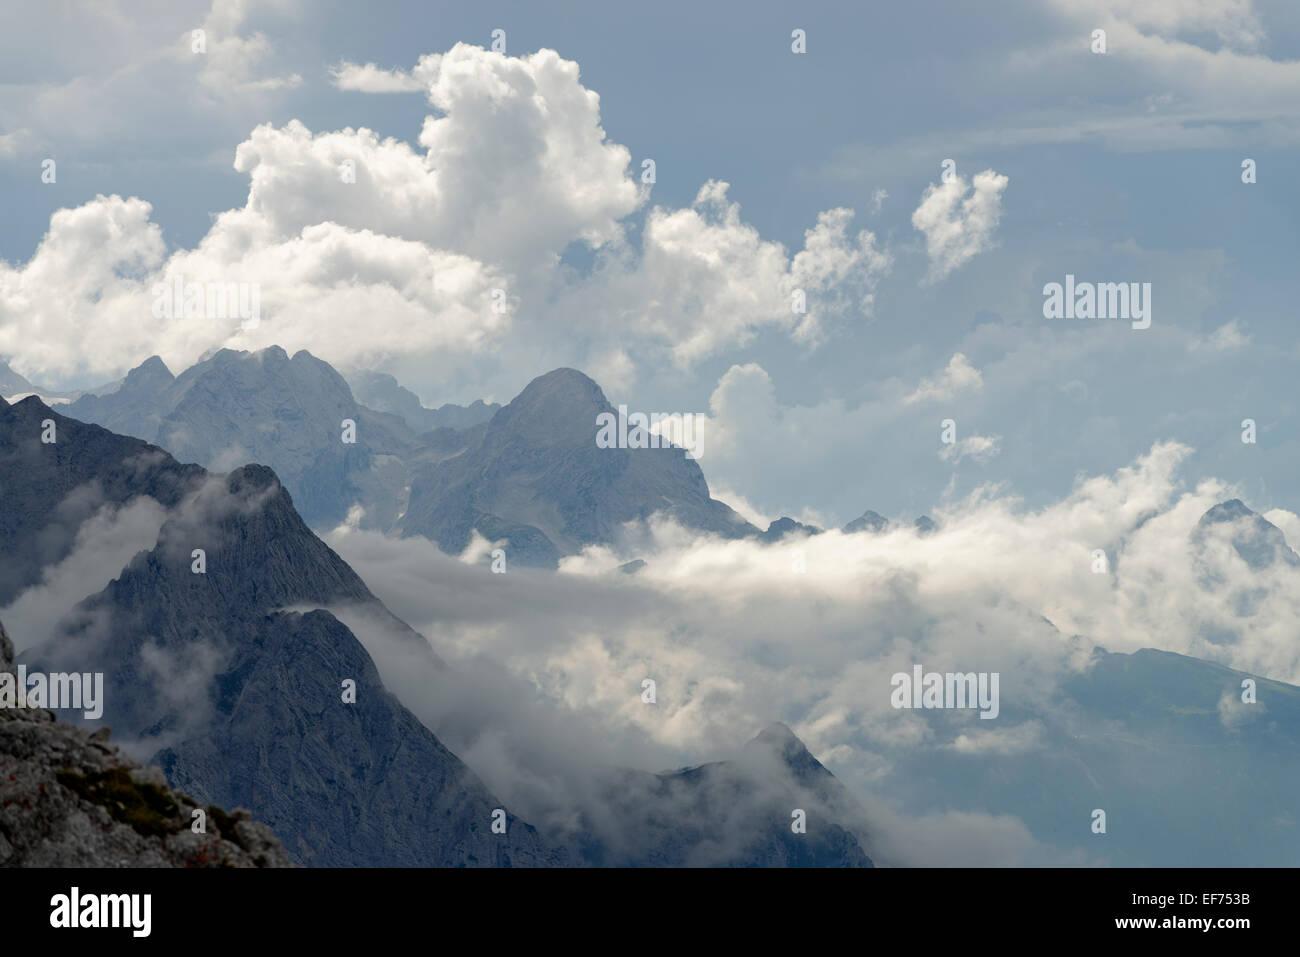 View from the Karwendelbahn, Karwendel Railway, on the Wetterstein range with Alpine peaks and atmospheric clouds - Stock Image